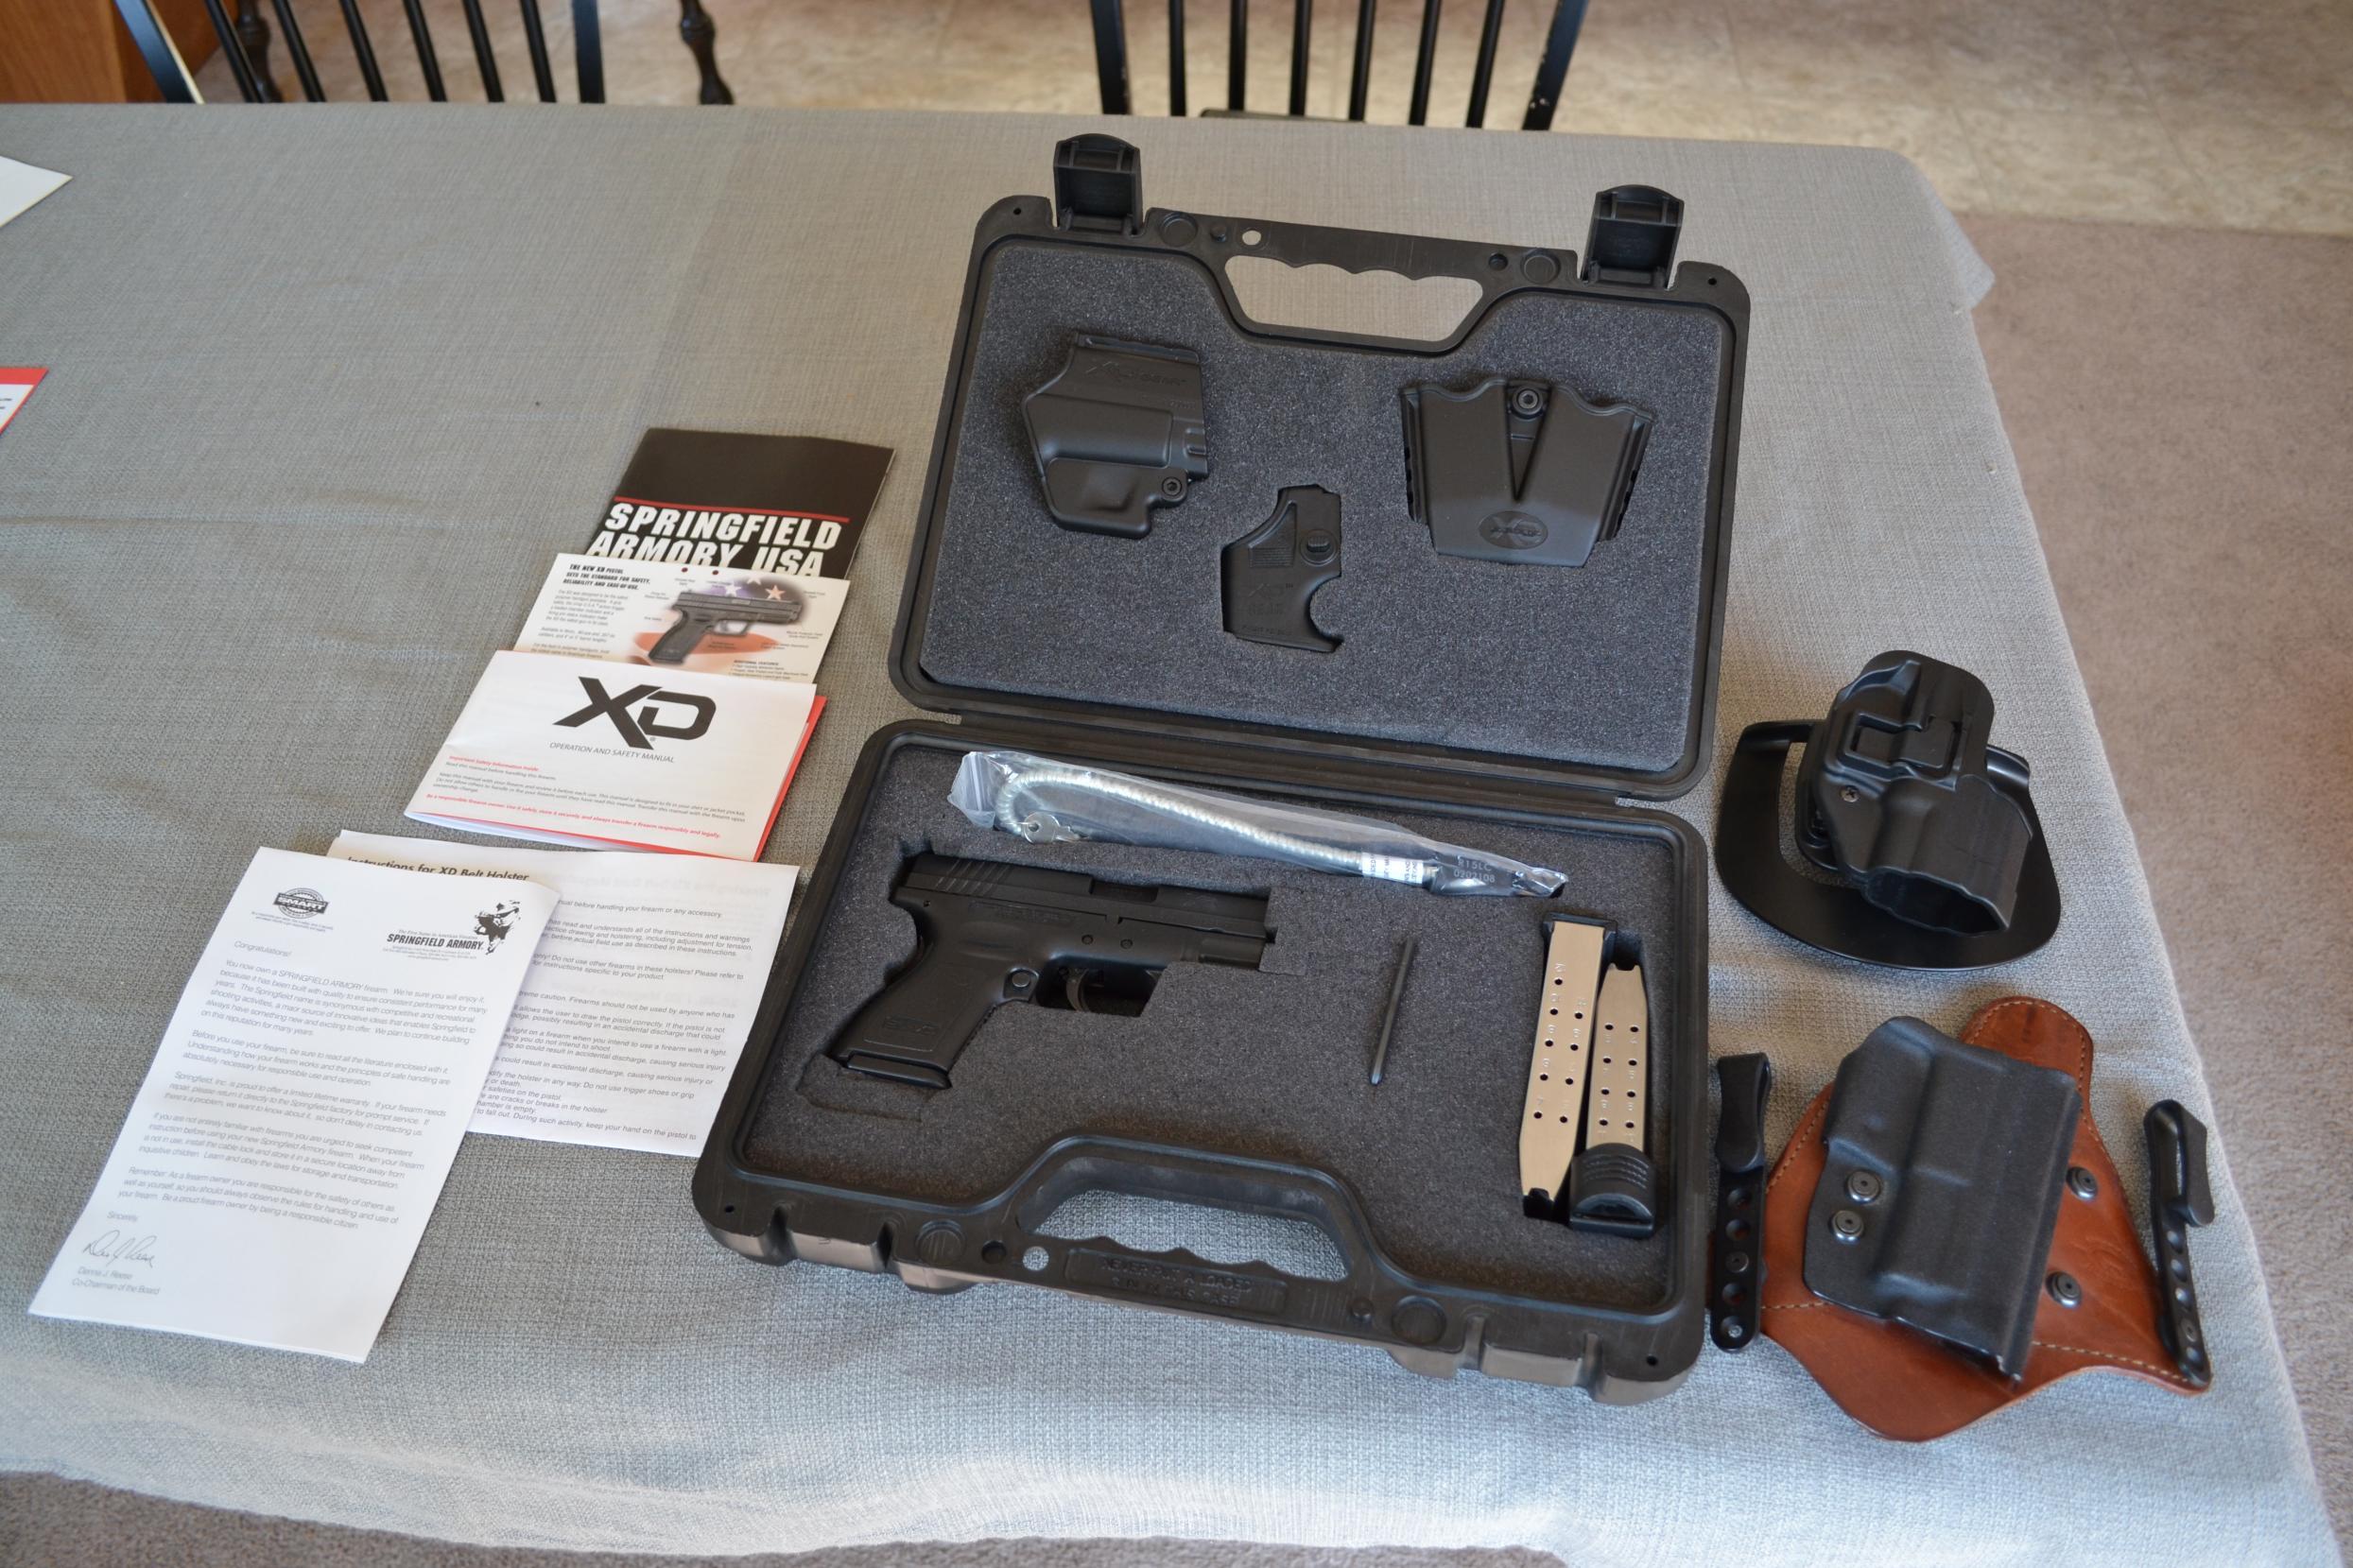 For Sale: Springfield XD40 Subcompact w/ Night Sights, Extras (Seattle, WA)-dsc_0003.jpg